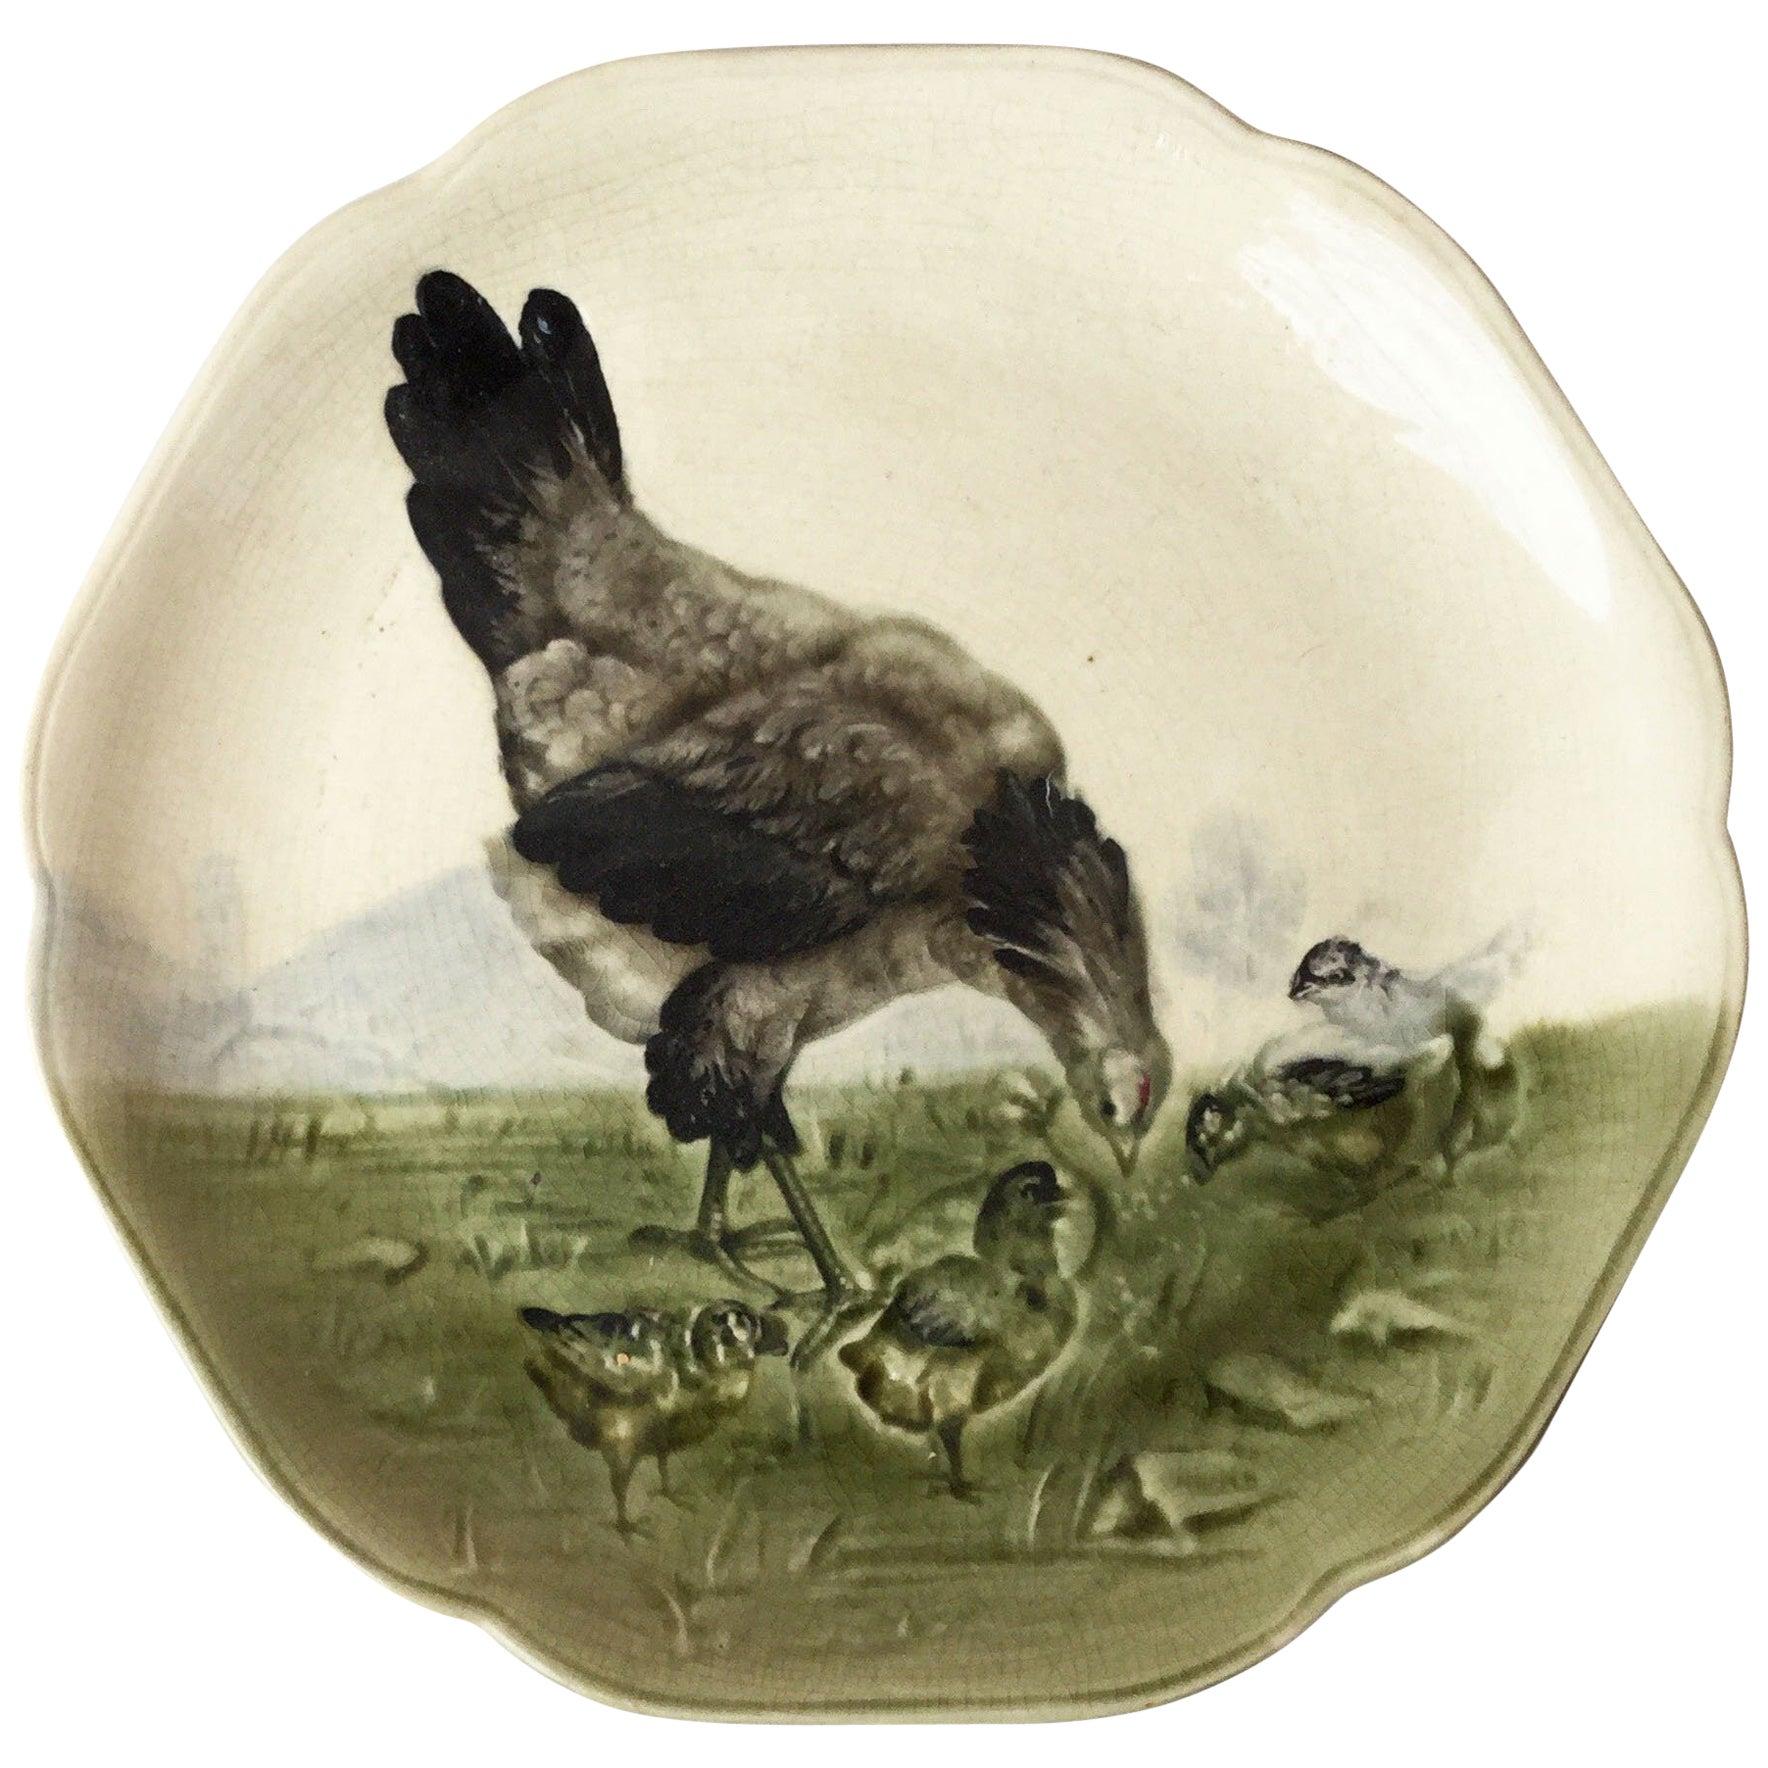 19th Century Majolica Hen and Chicks Plate Choisy Le Roi